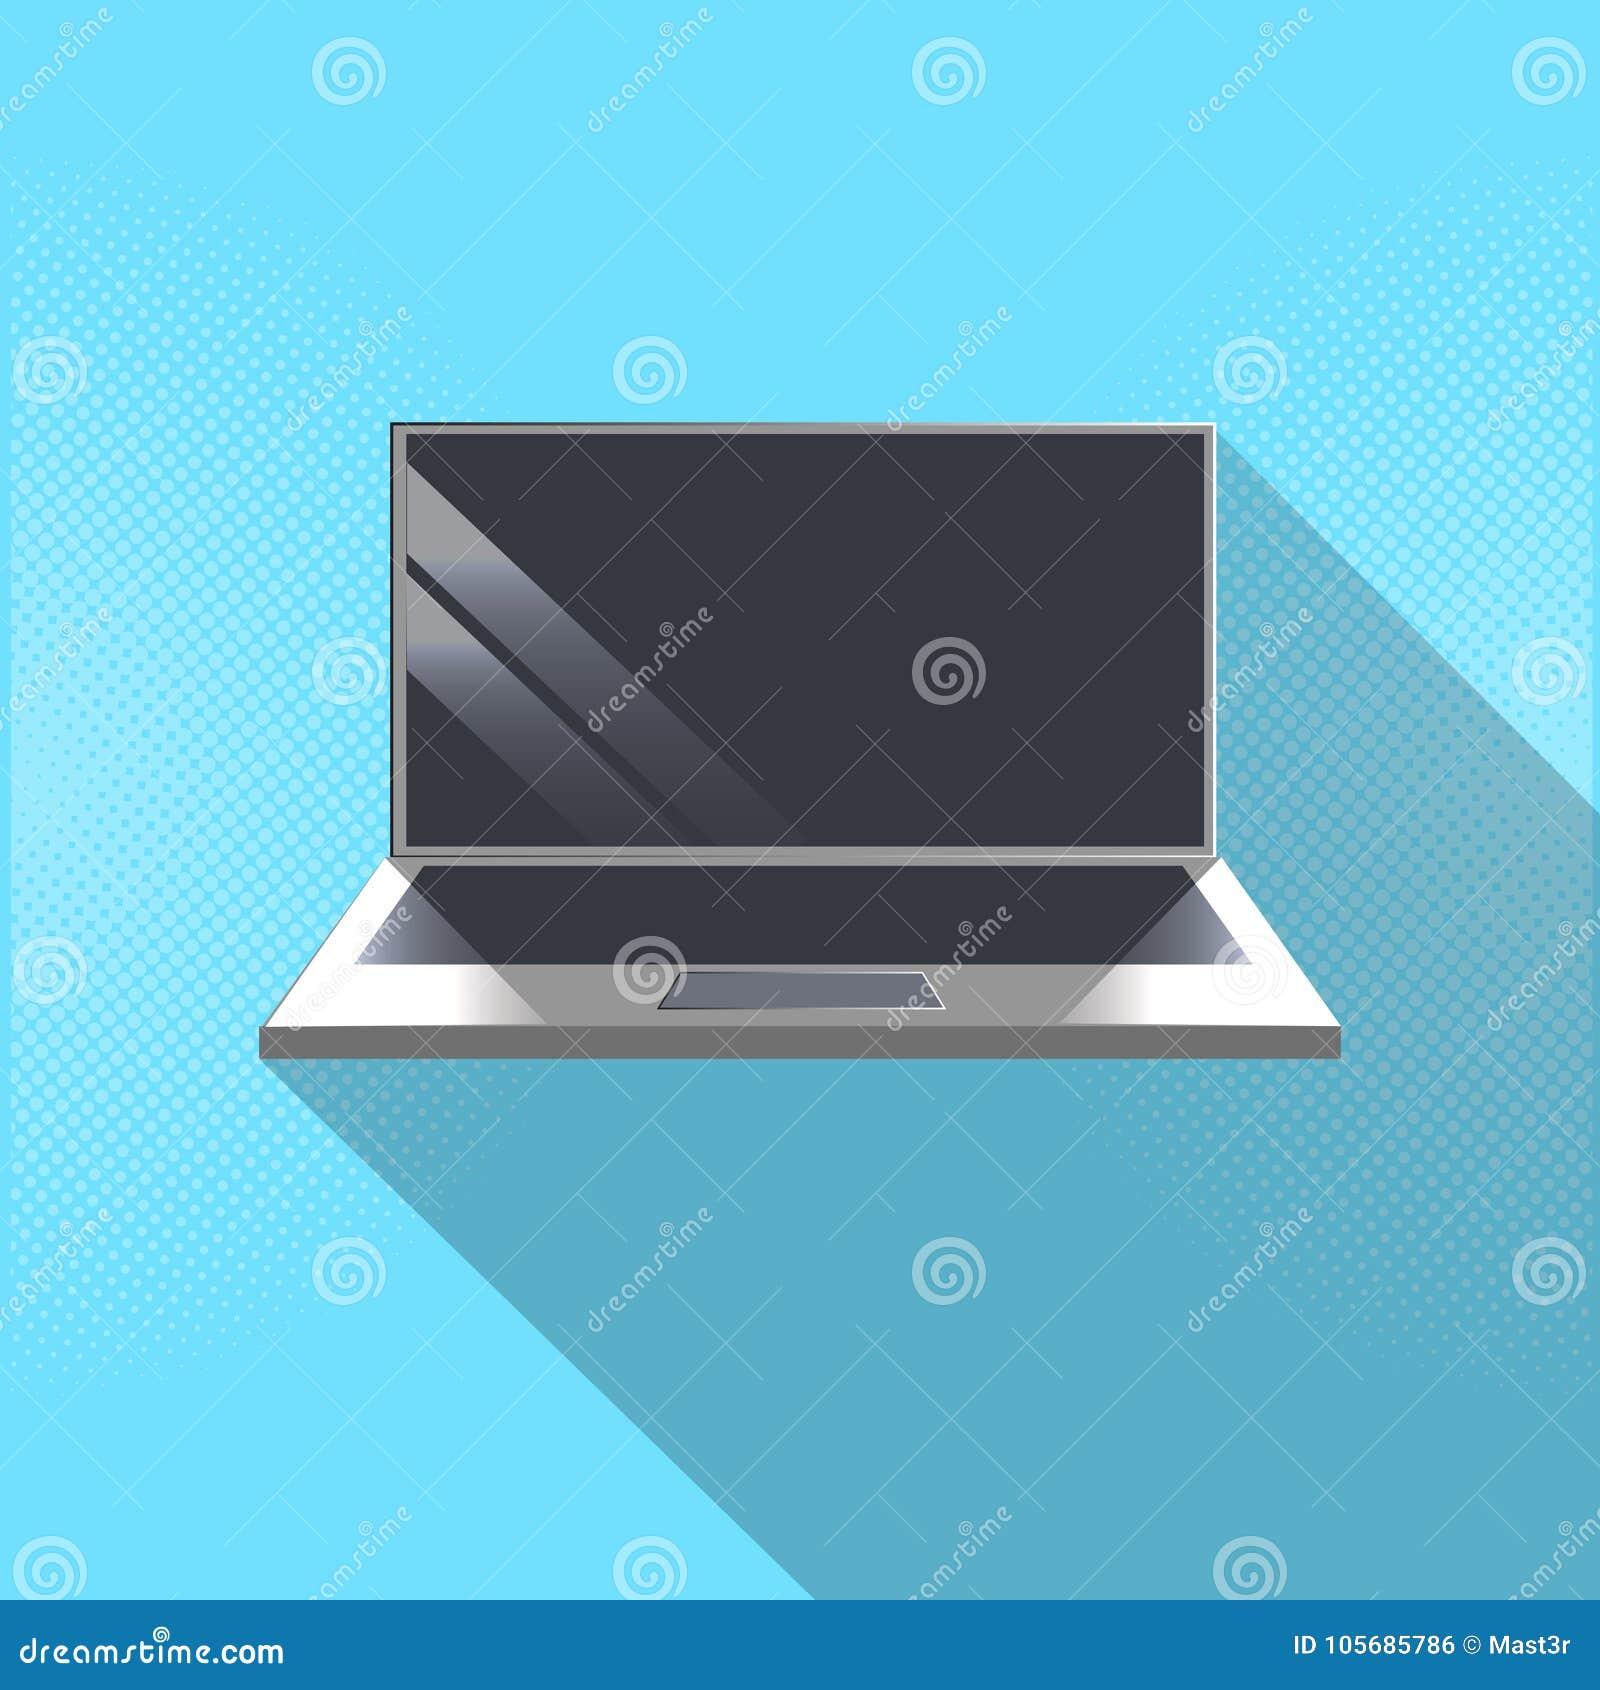 Laptop Computer Icon Modern Portable Gadget